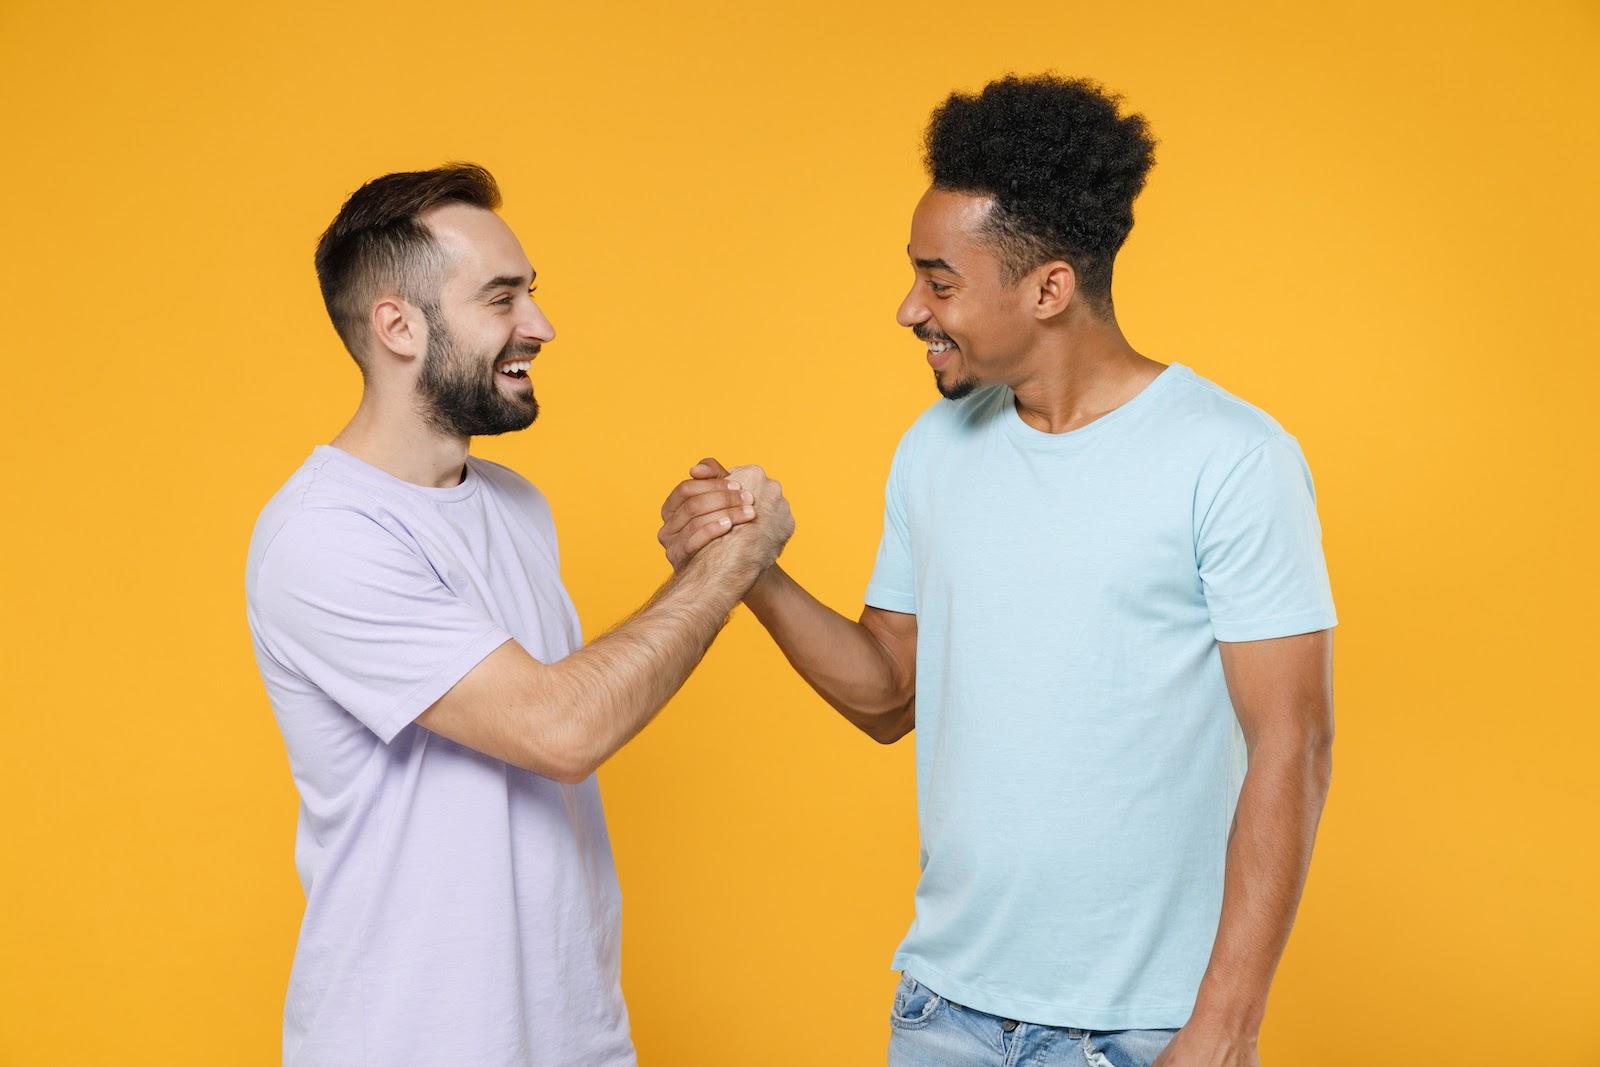 How to run a meeting: Two team members shake hands